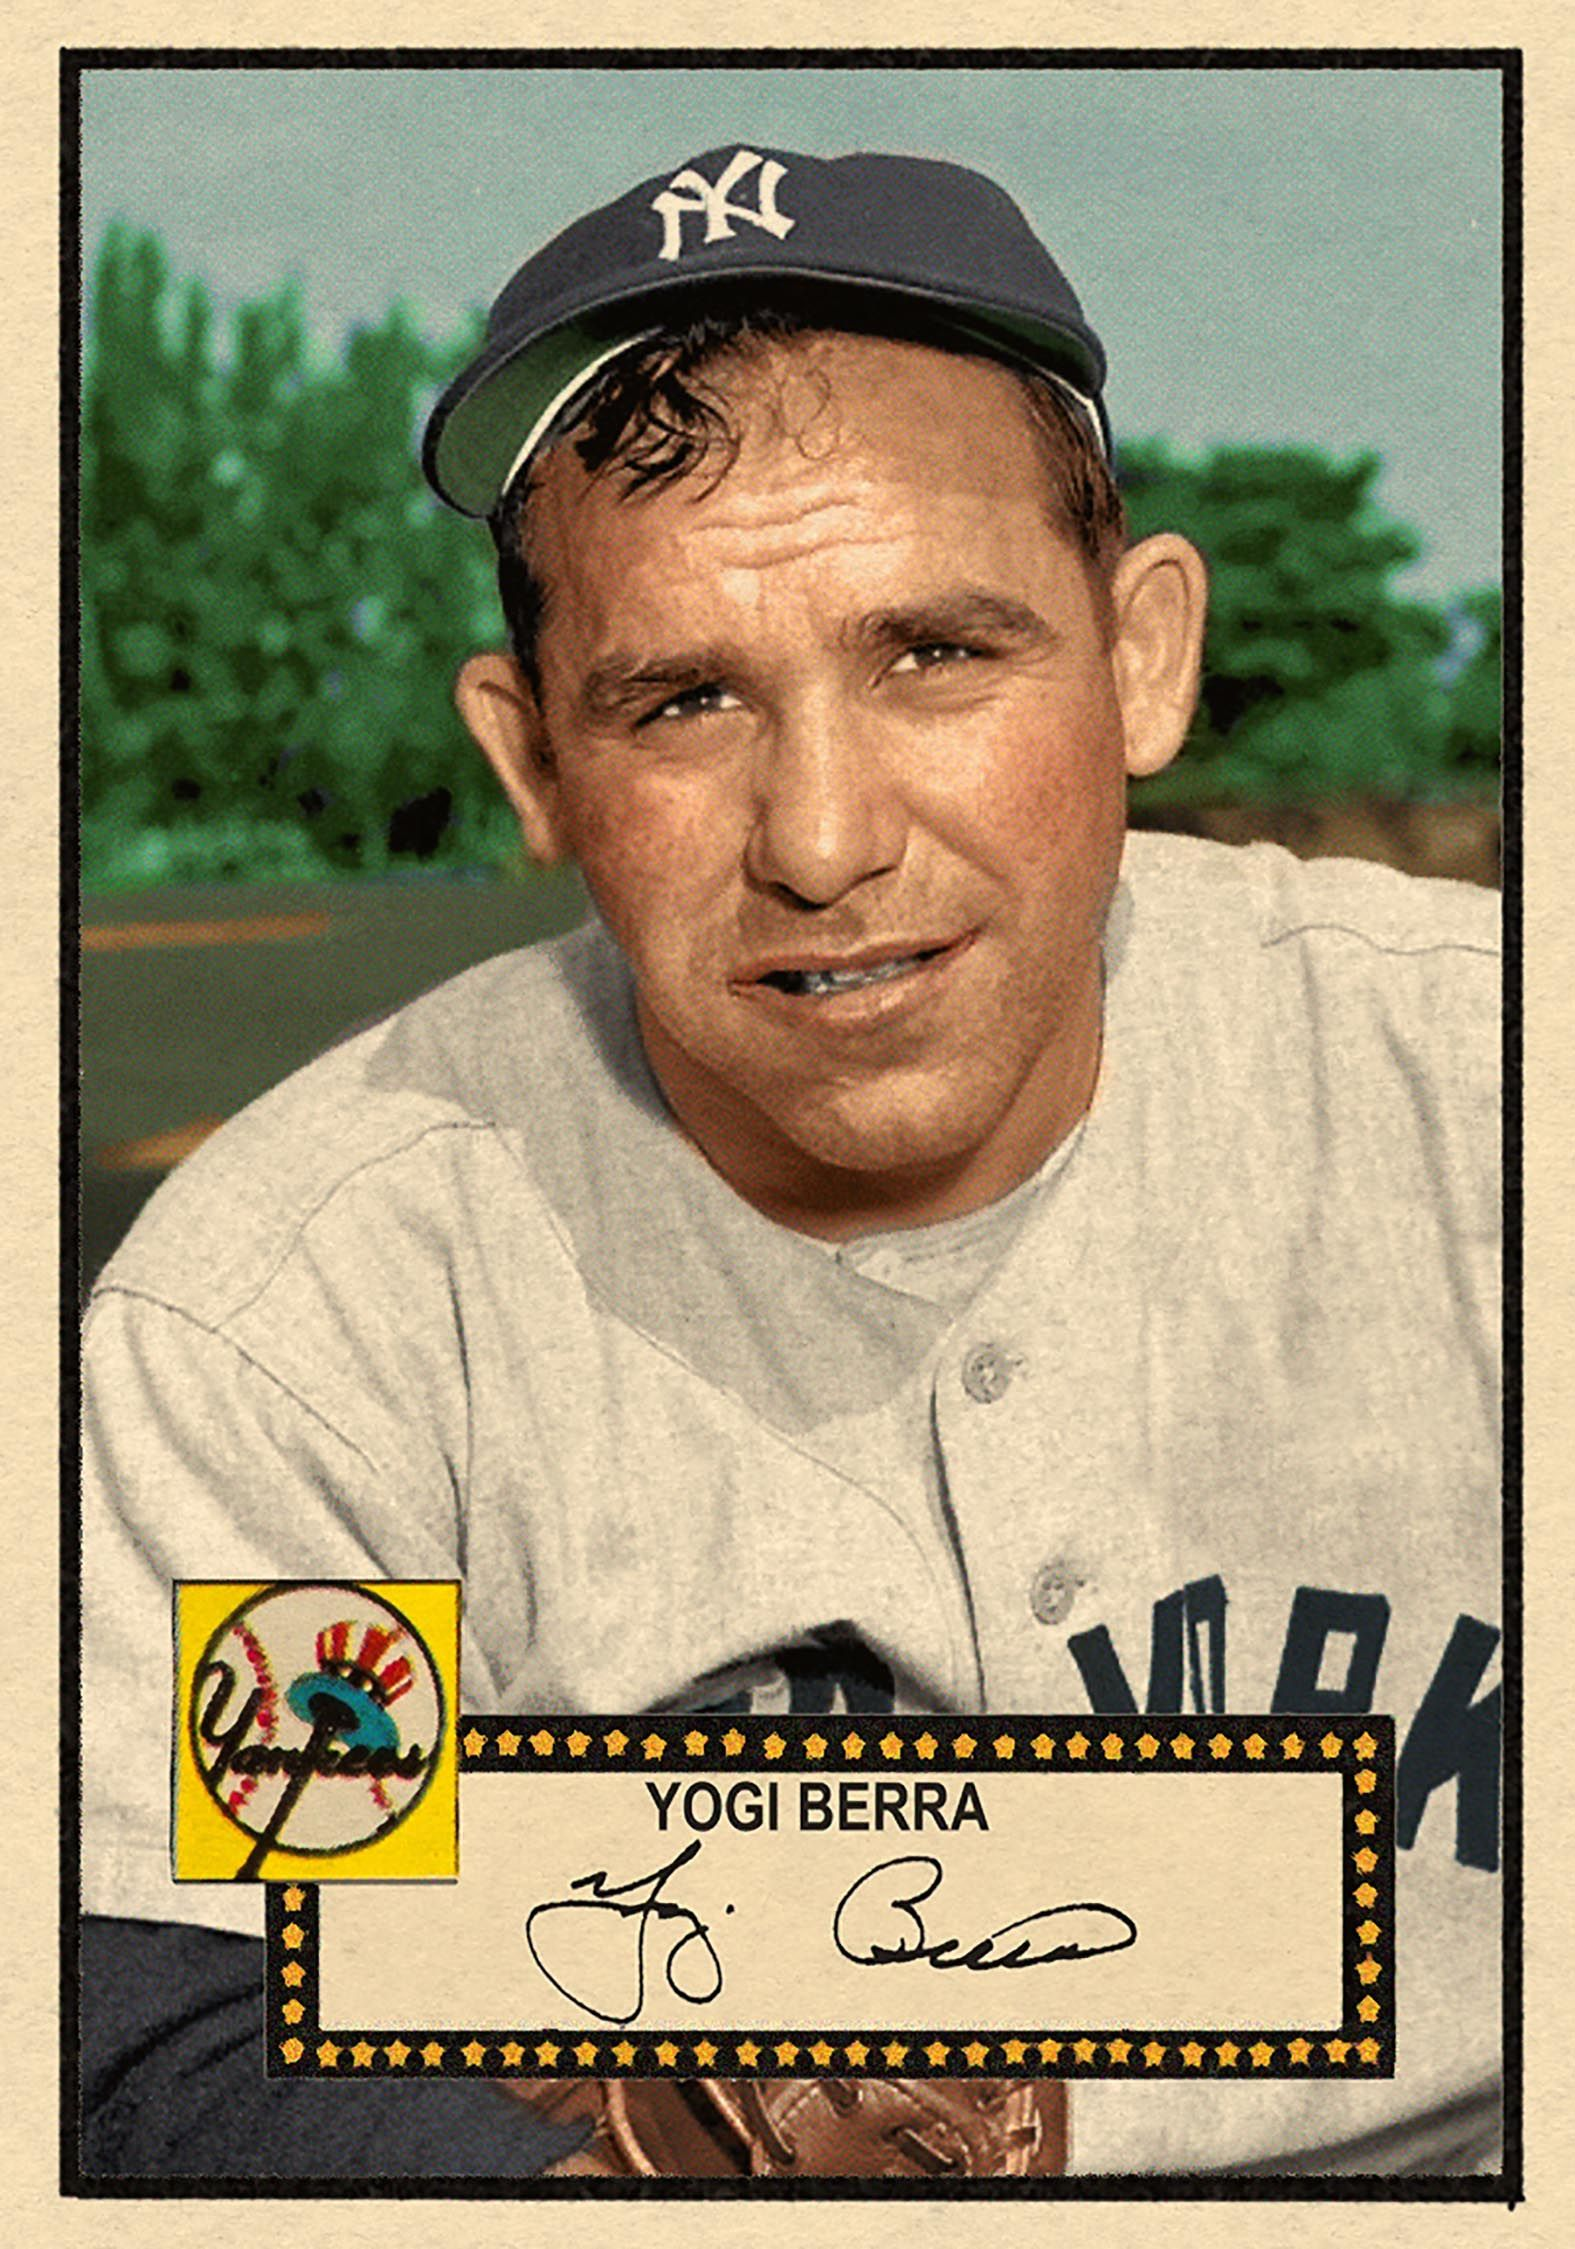 Pin By Buford On Baseball Cards Photos In 2021 Yogi Berra Baseball Cards Yogi